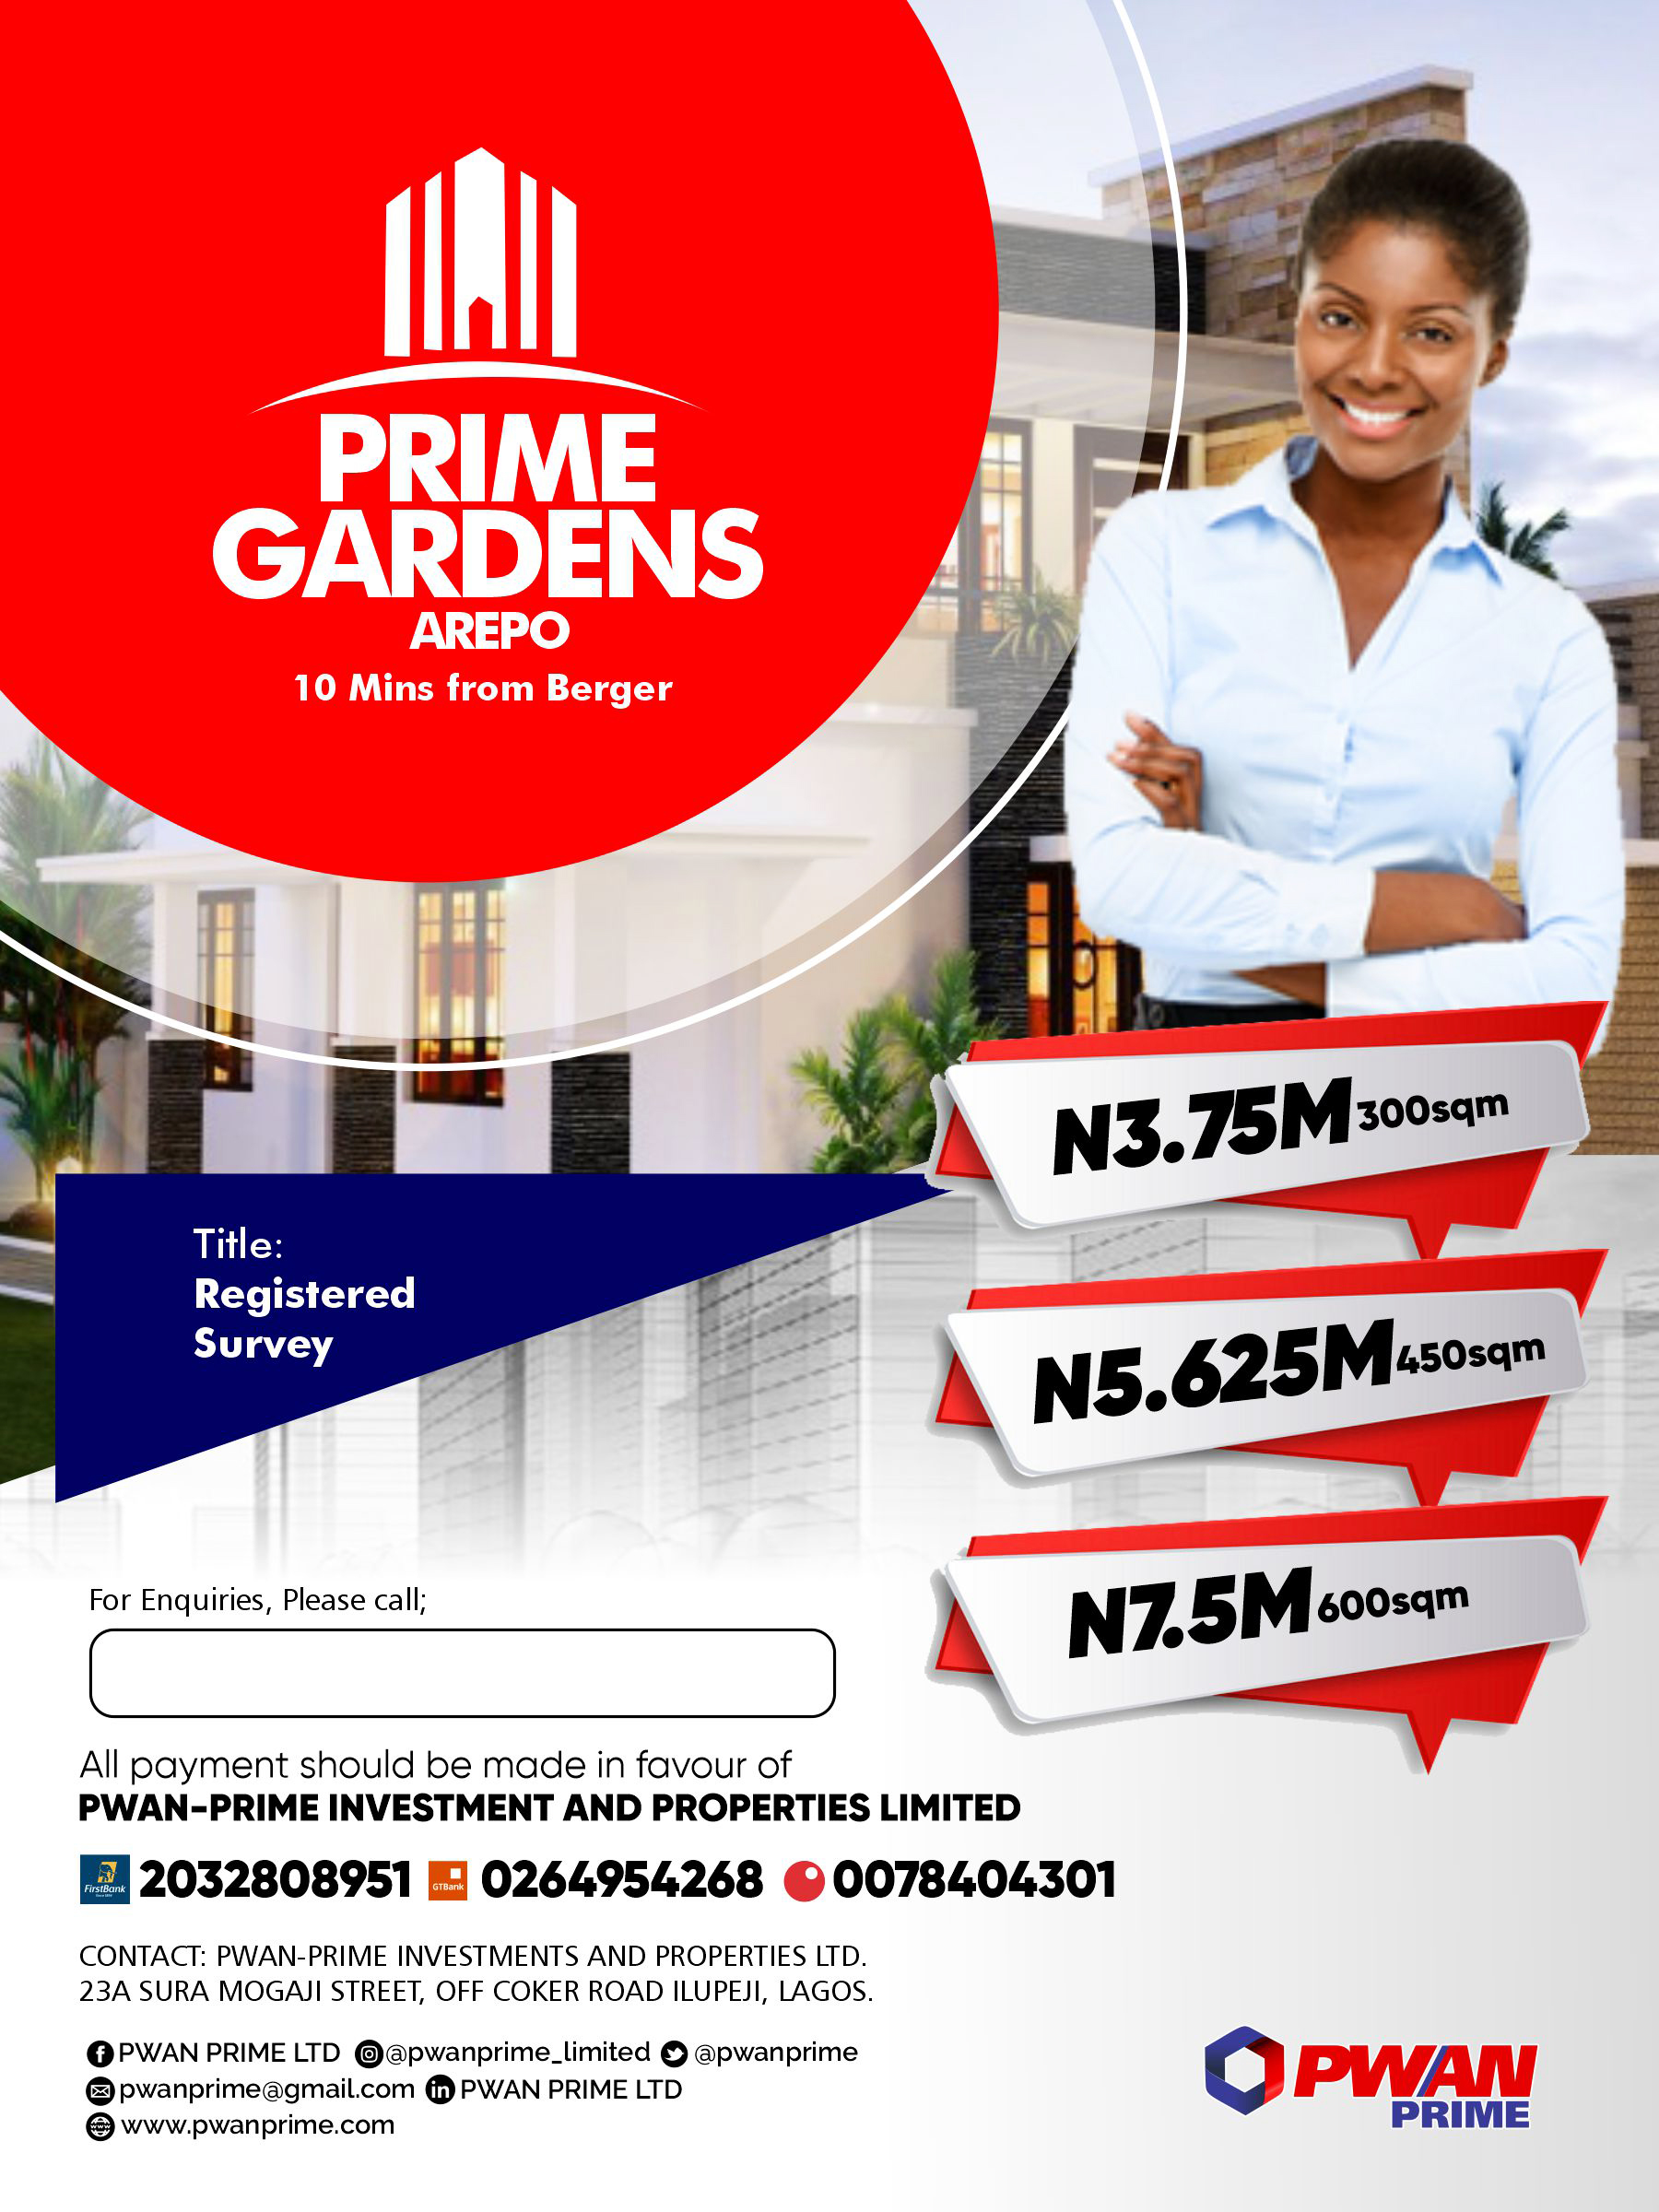 Prime Gardens Arepo